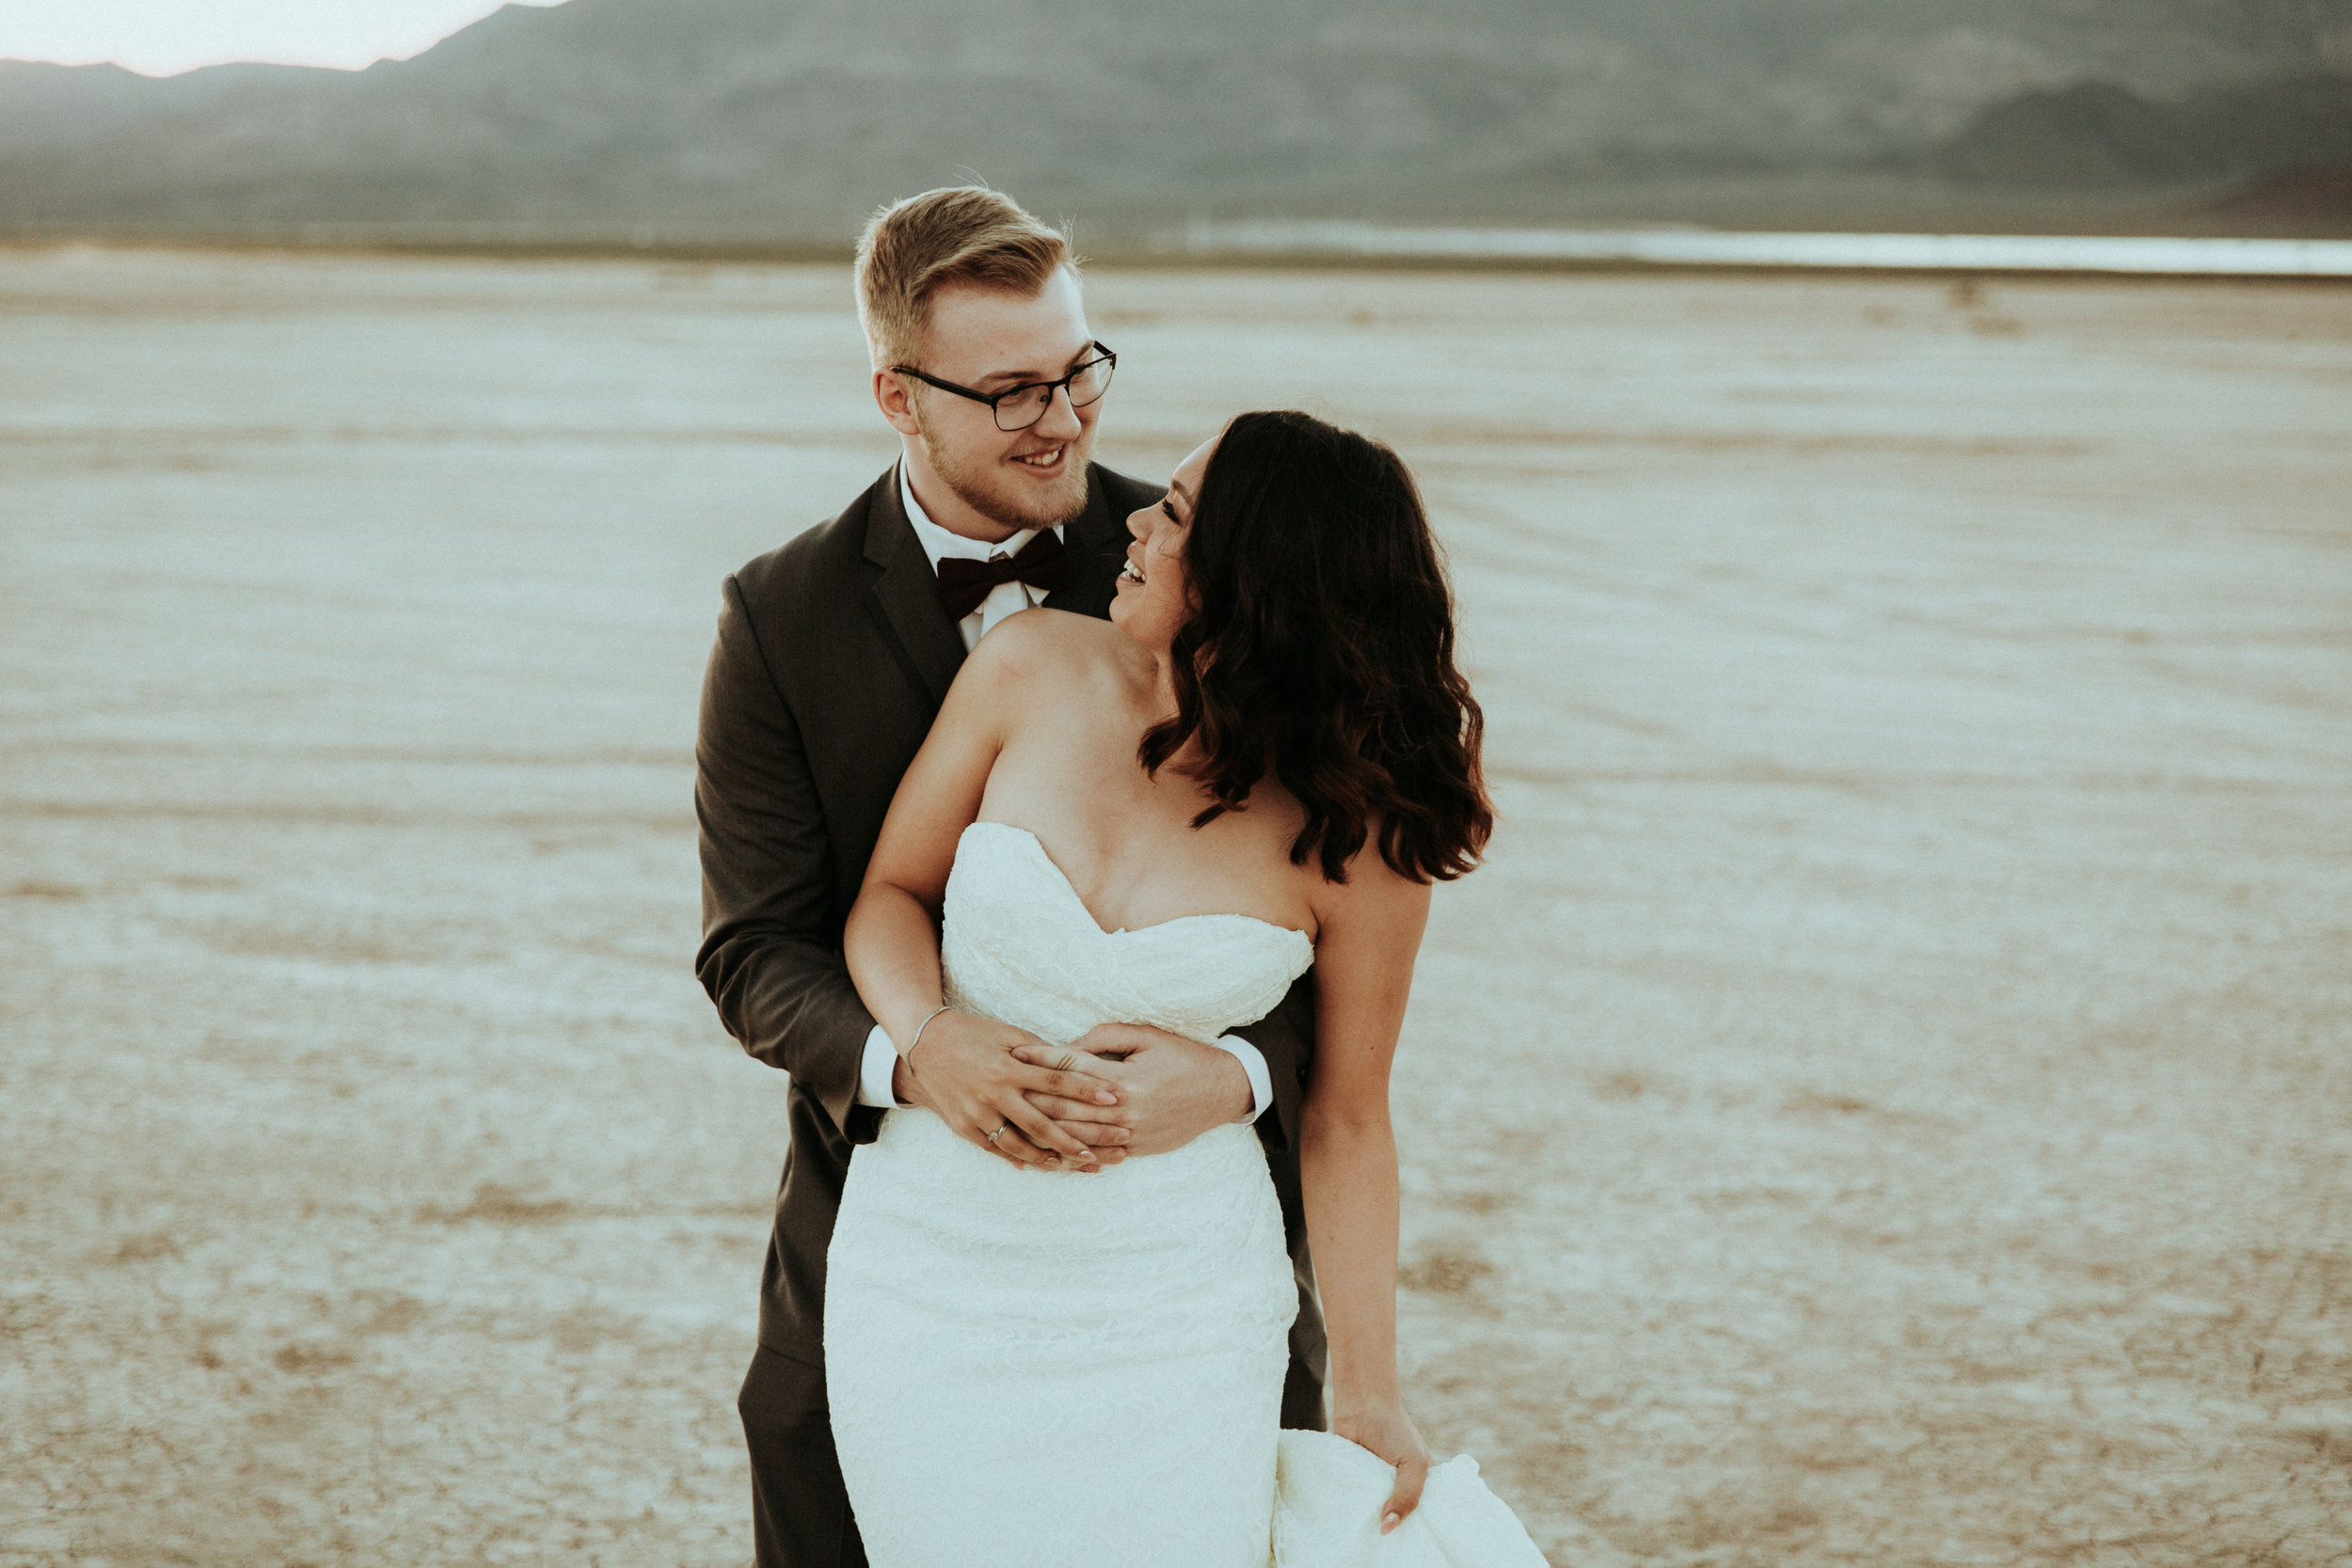 Las Vegas Wedding Photographer - Henderson, NV - Seattle, WA - PNW Wedding Photographer - Portland Wedding Photographer - Wedding Portraits - First Look